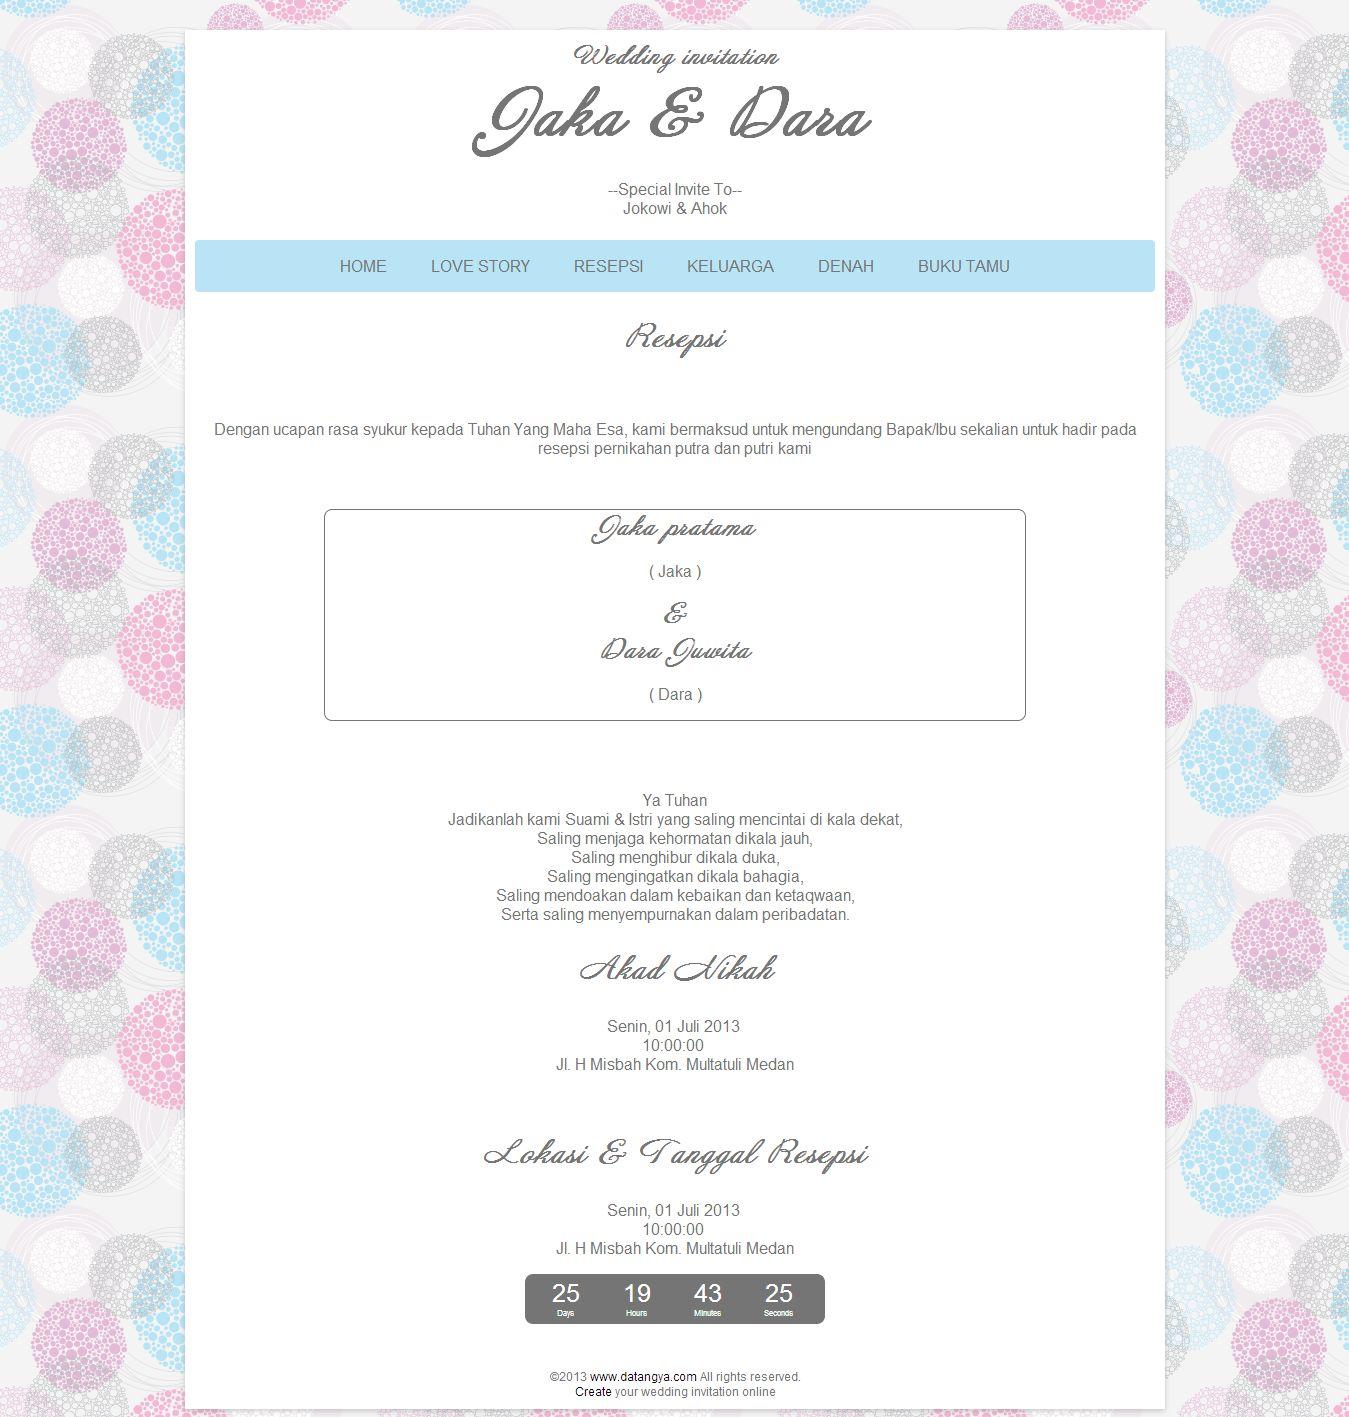 Contoh Undangan Pernikahan Membuat Undangan Pernikahan Online Free